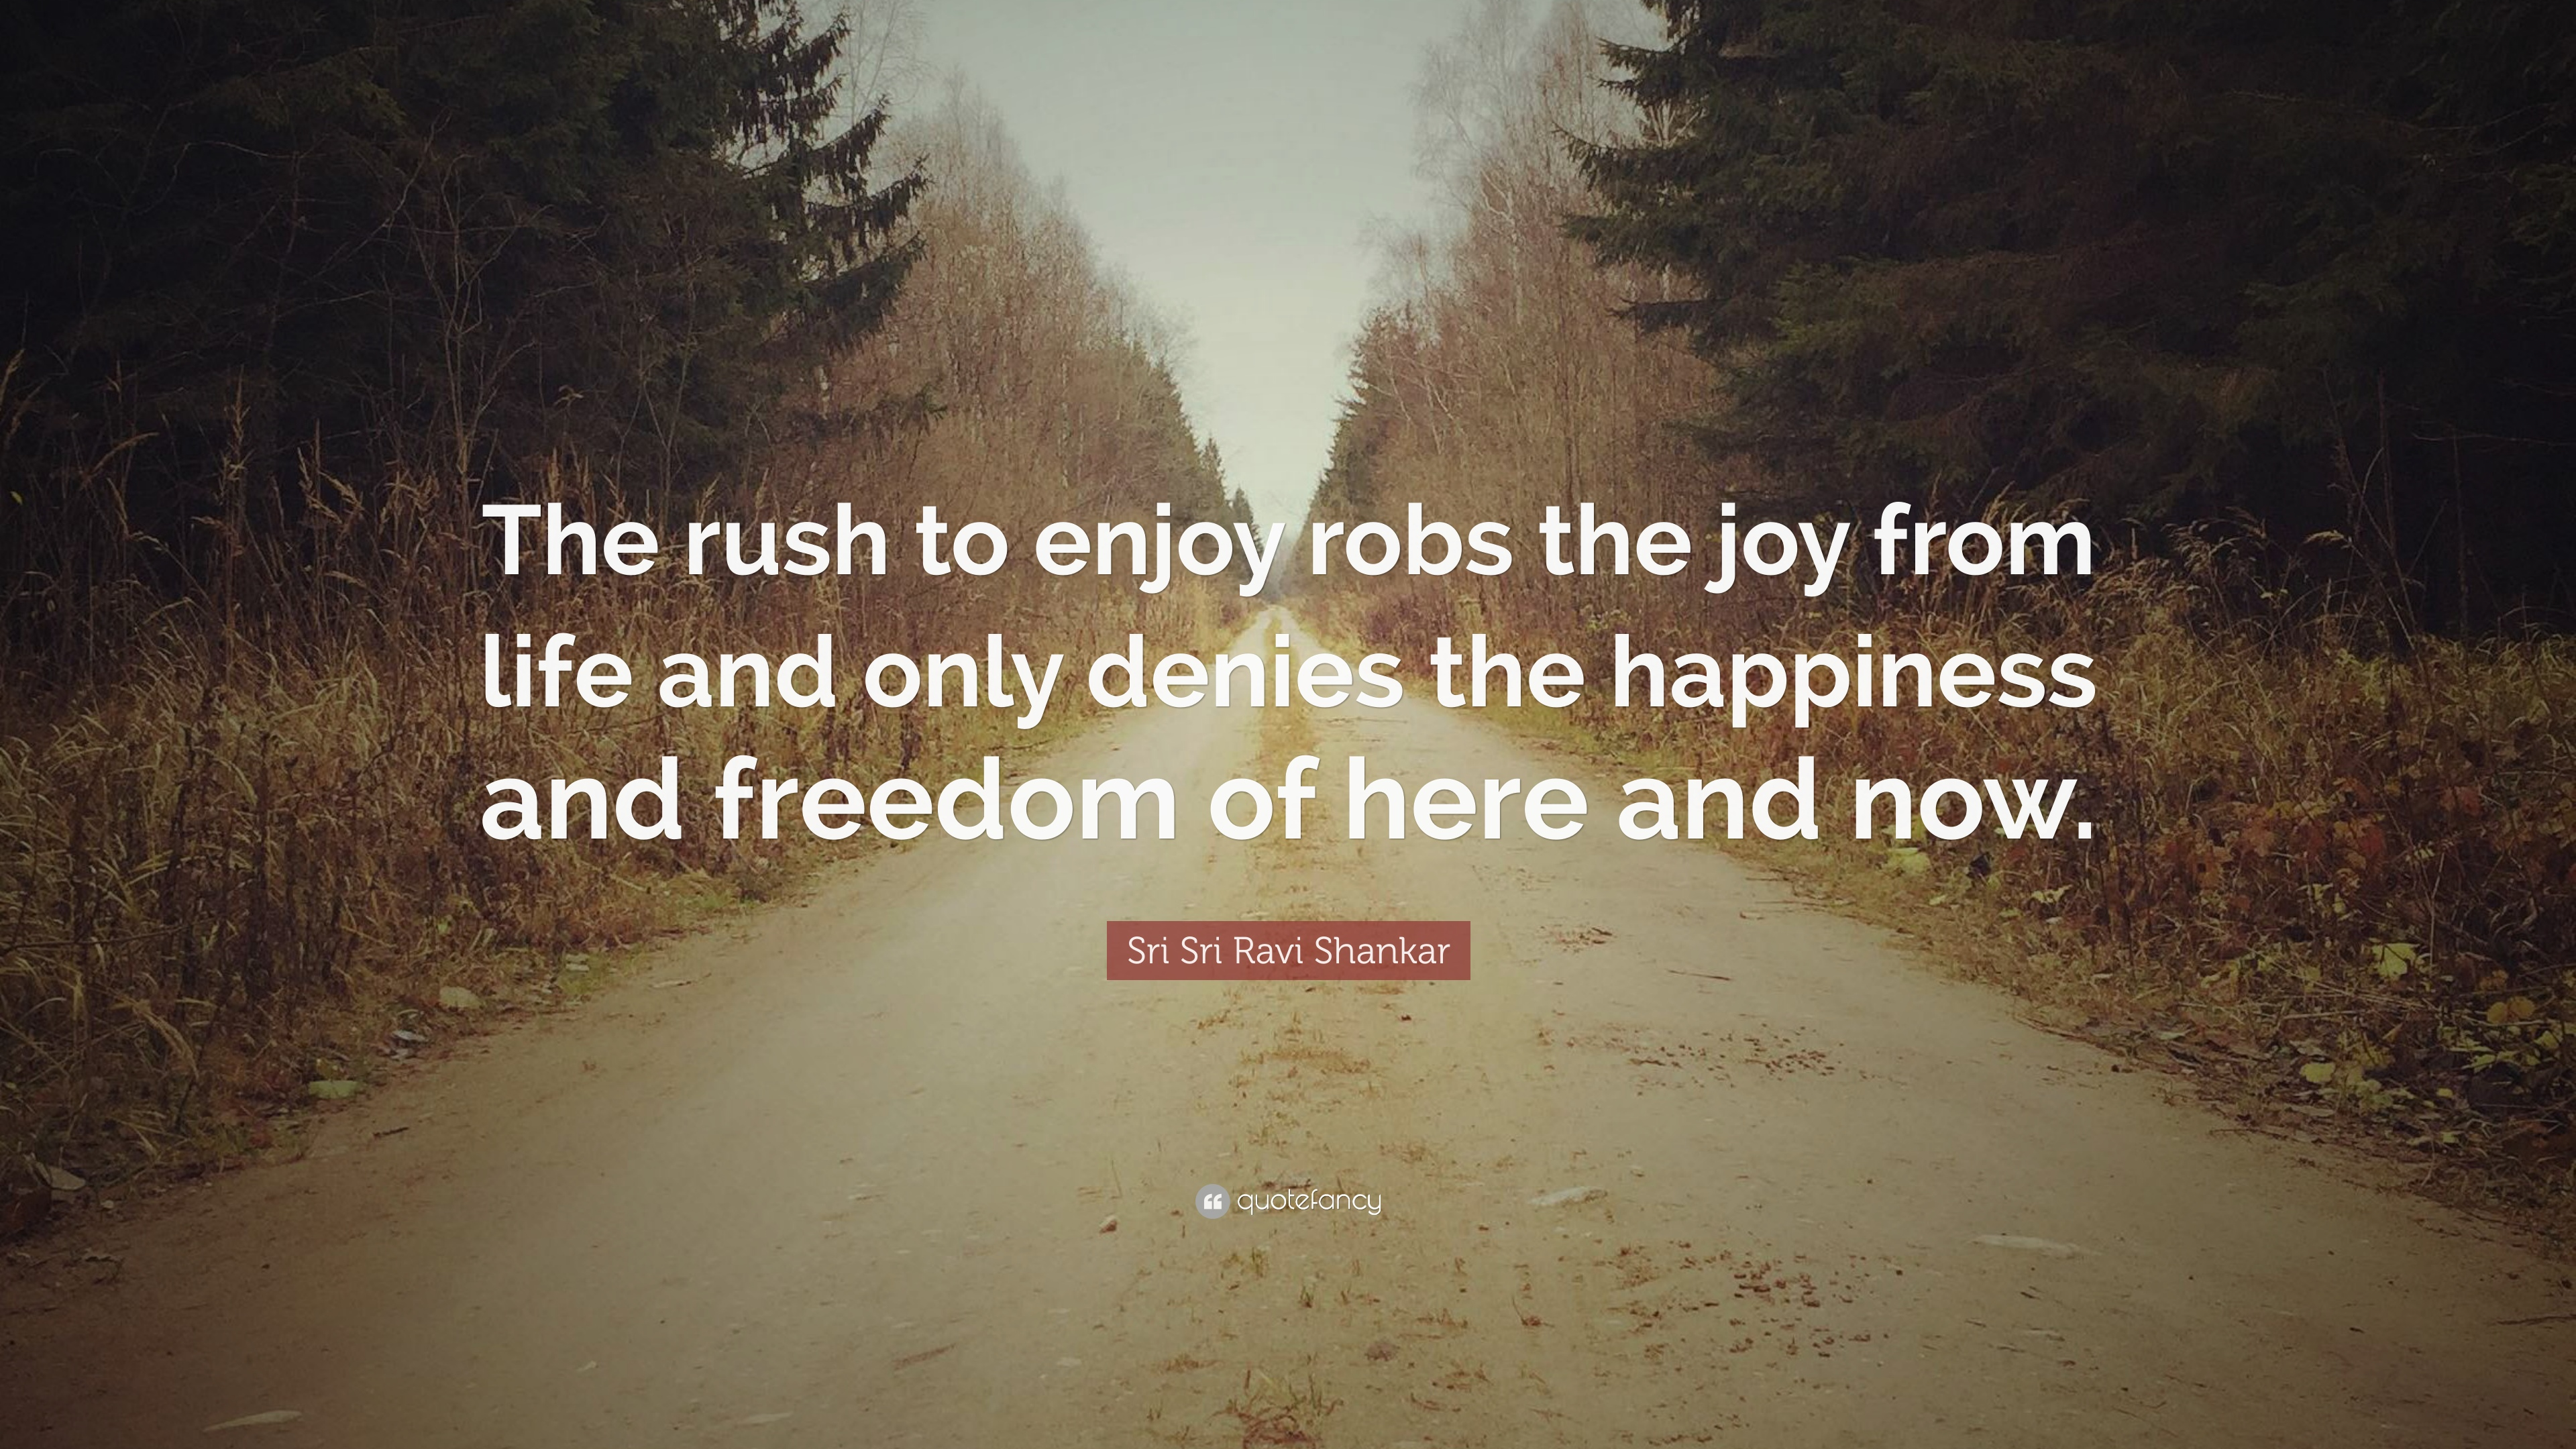 Sri Sri Ravi Shankar Quote The Rush To Enjoy Robs The Joy From